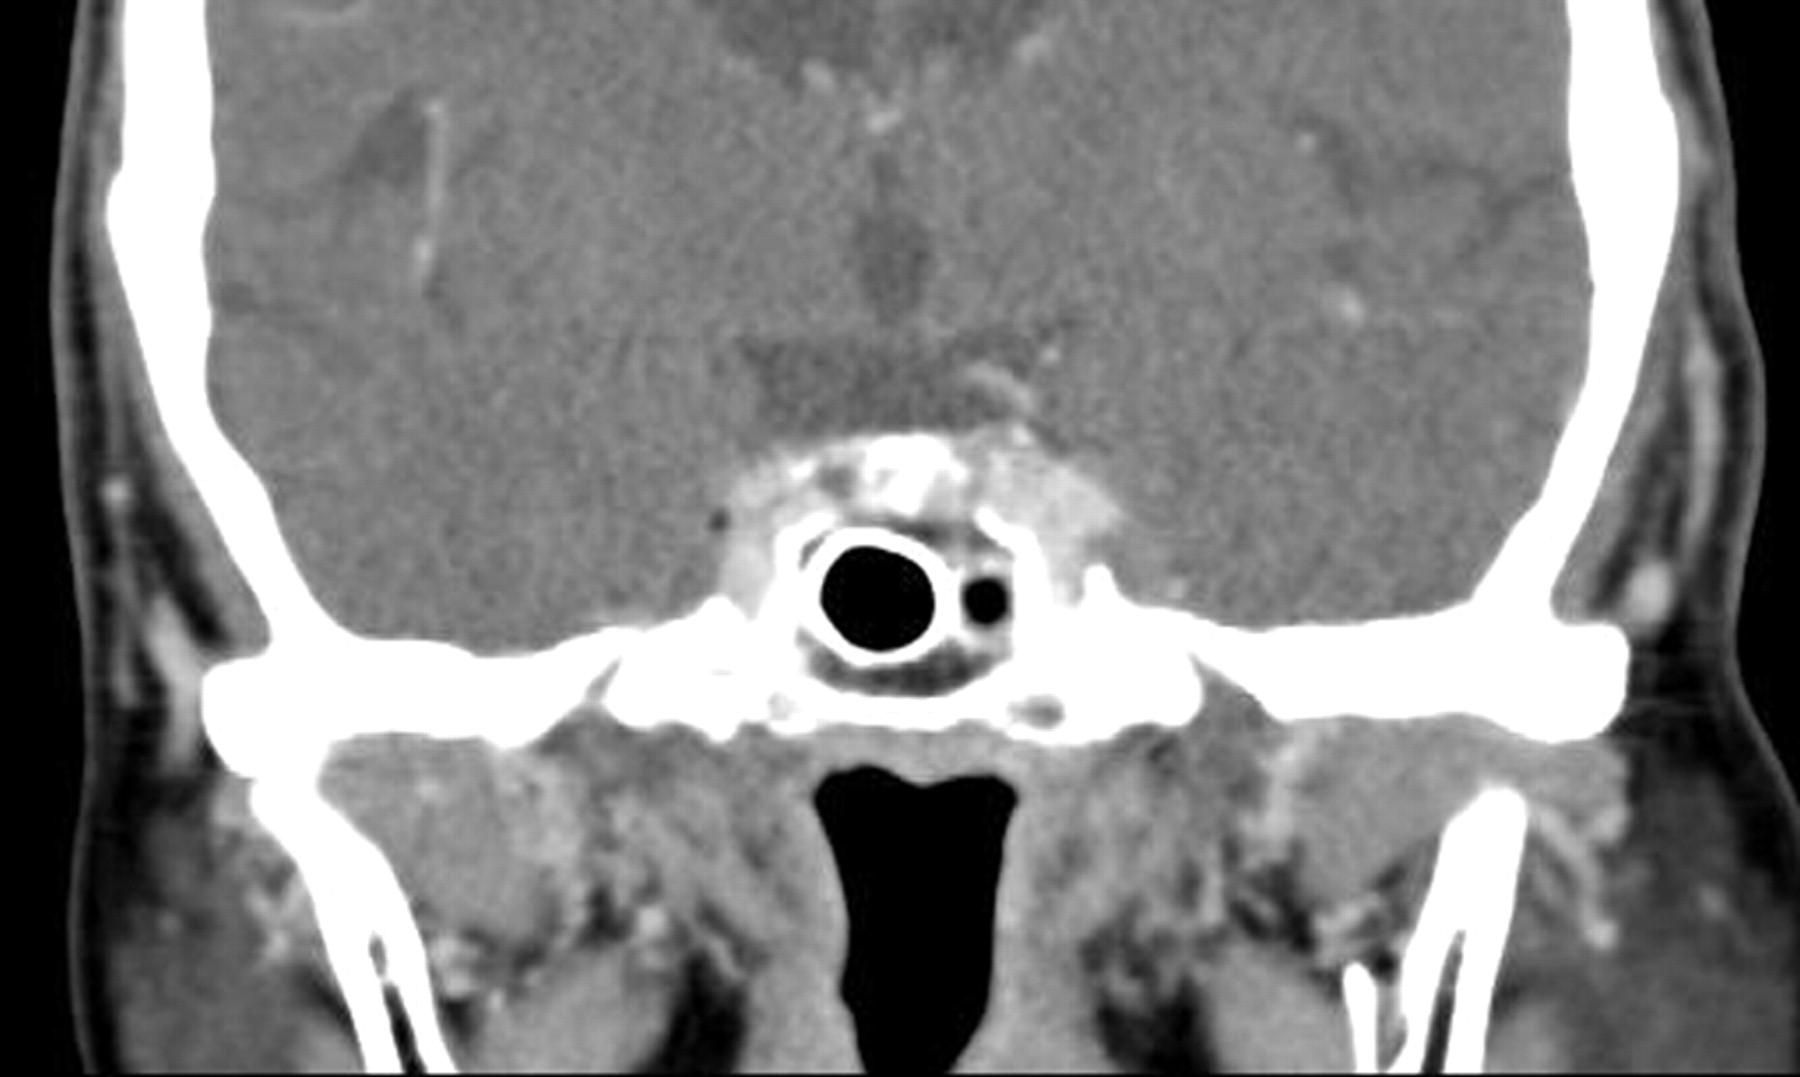 Cavernous+sinus+thrombosis+mri+findings